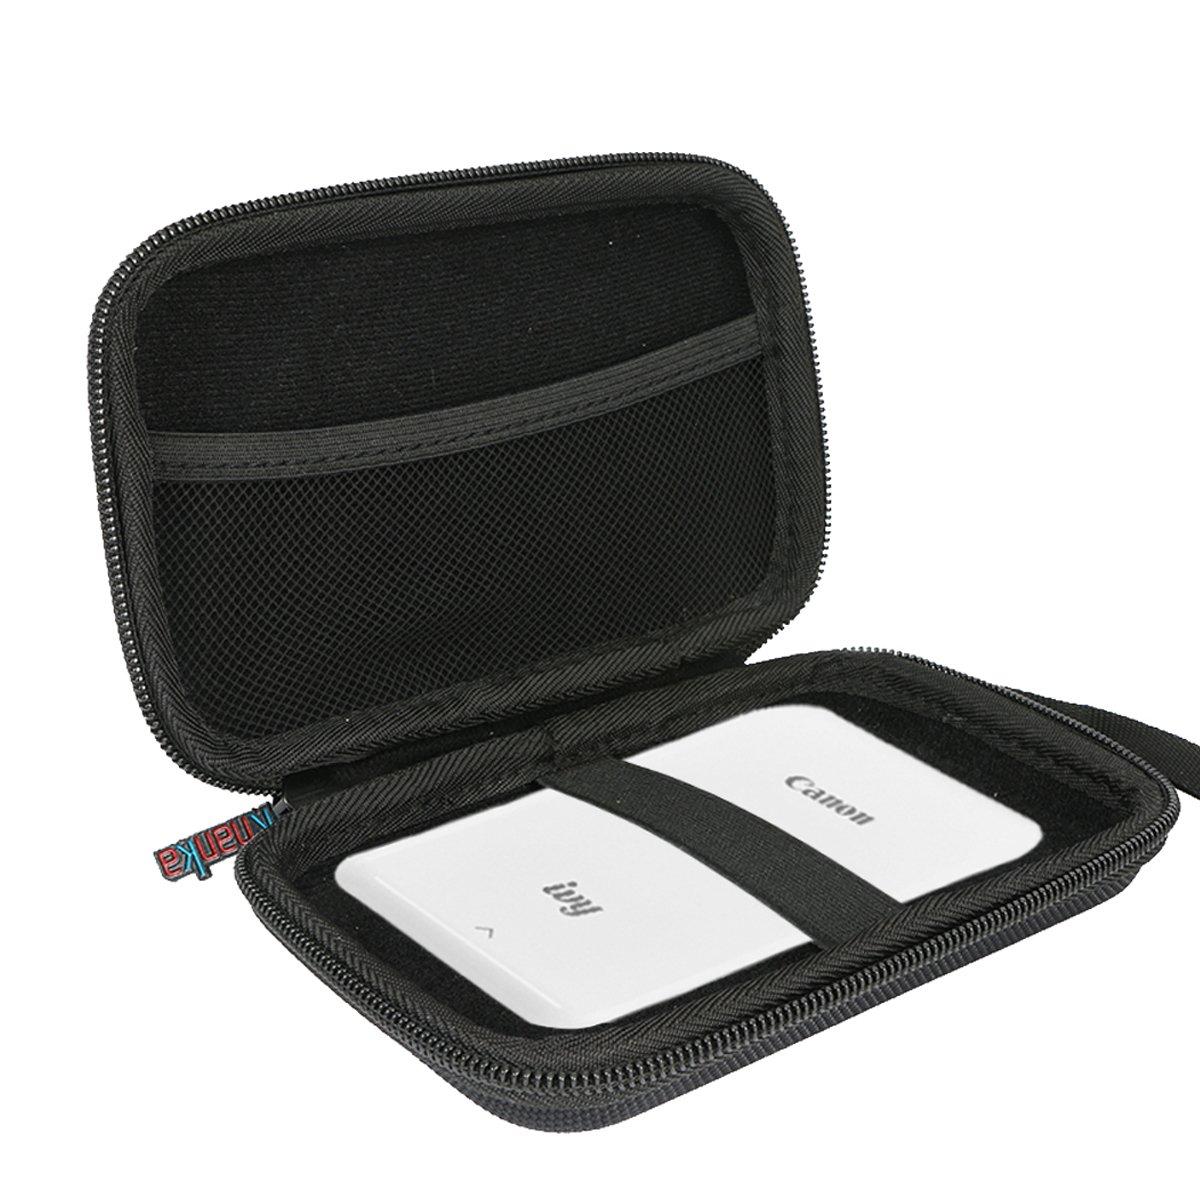 Khanka case Tasche Schutzh/ülle f/ür HP Sprocket Plus Mobiler Fotodrucker. rot//Weiss